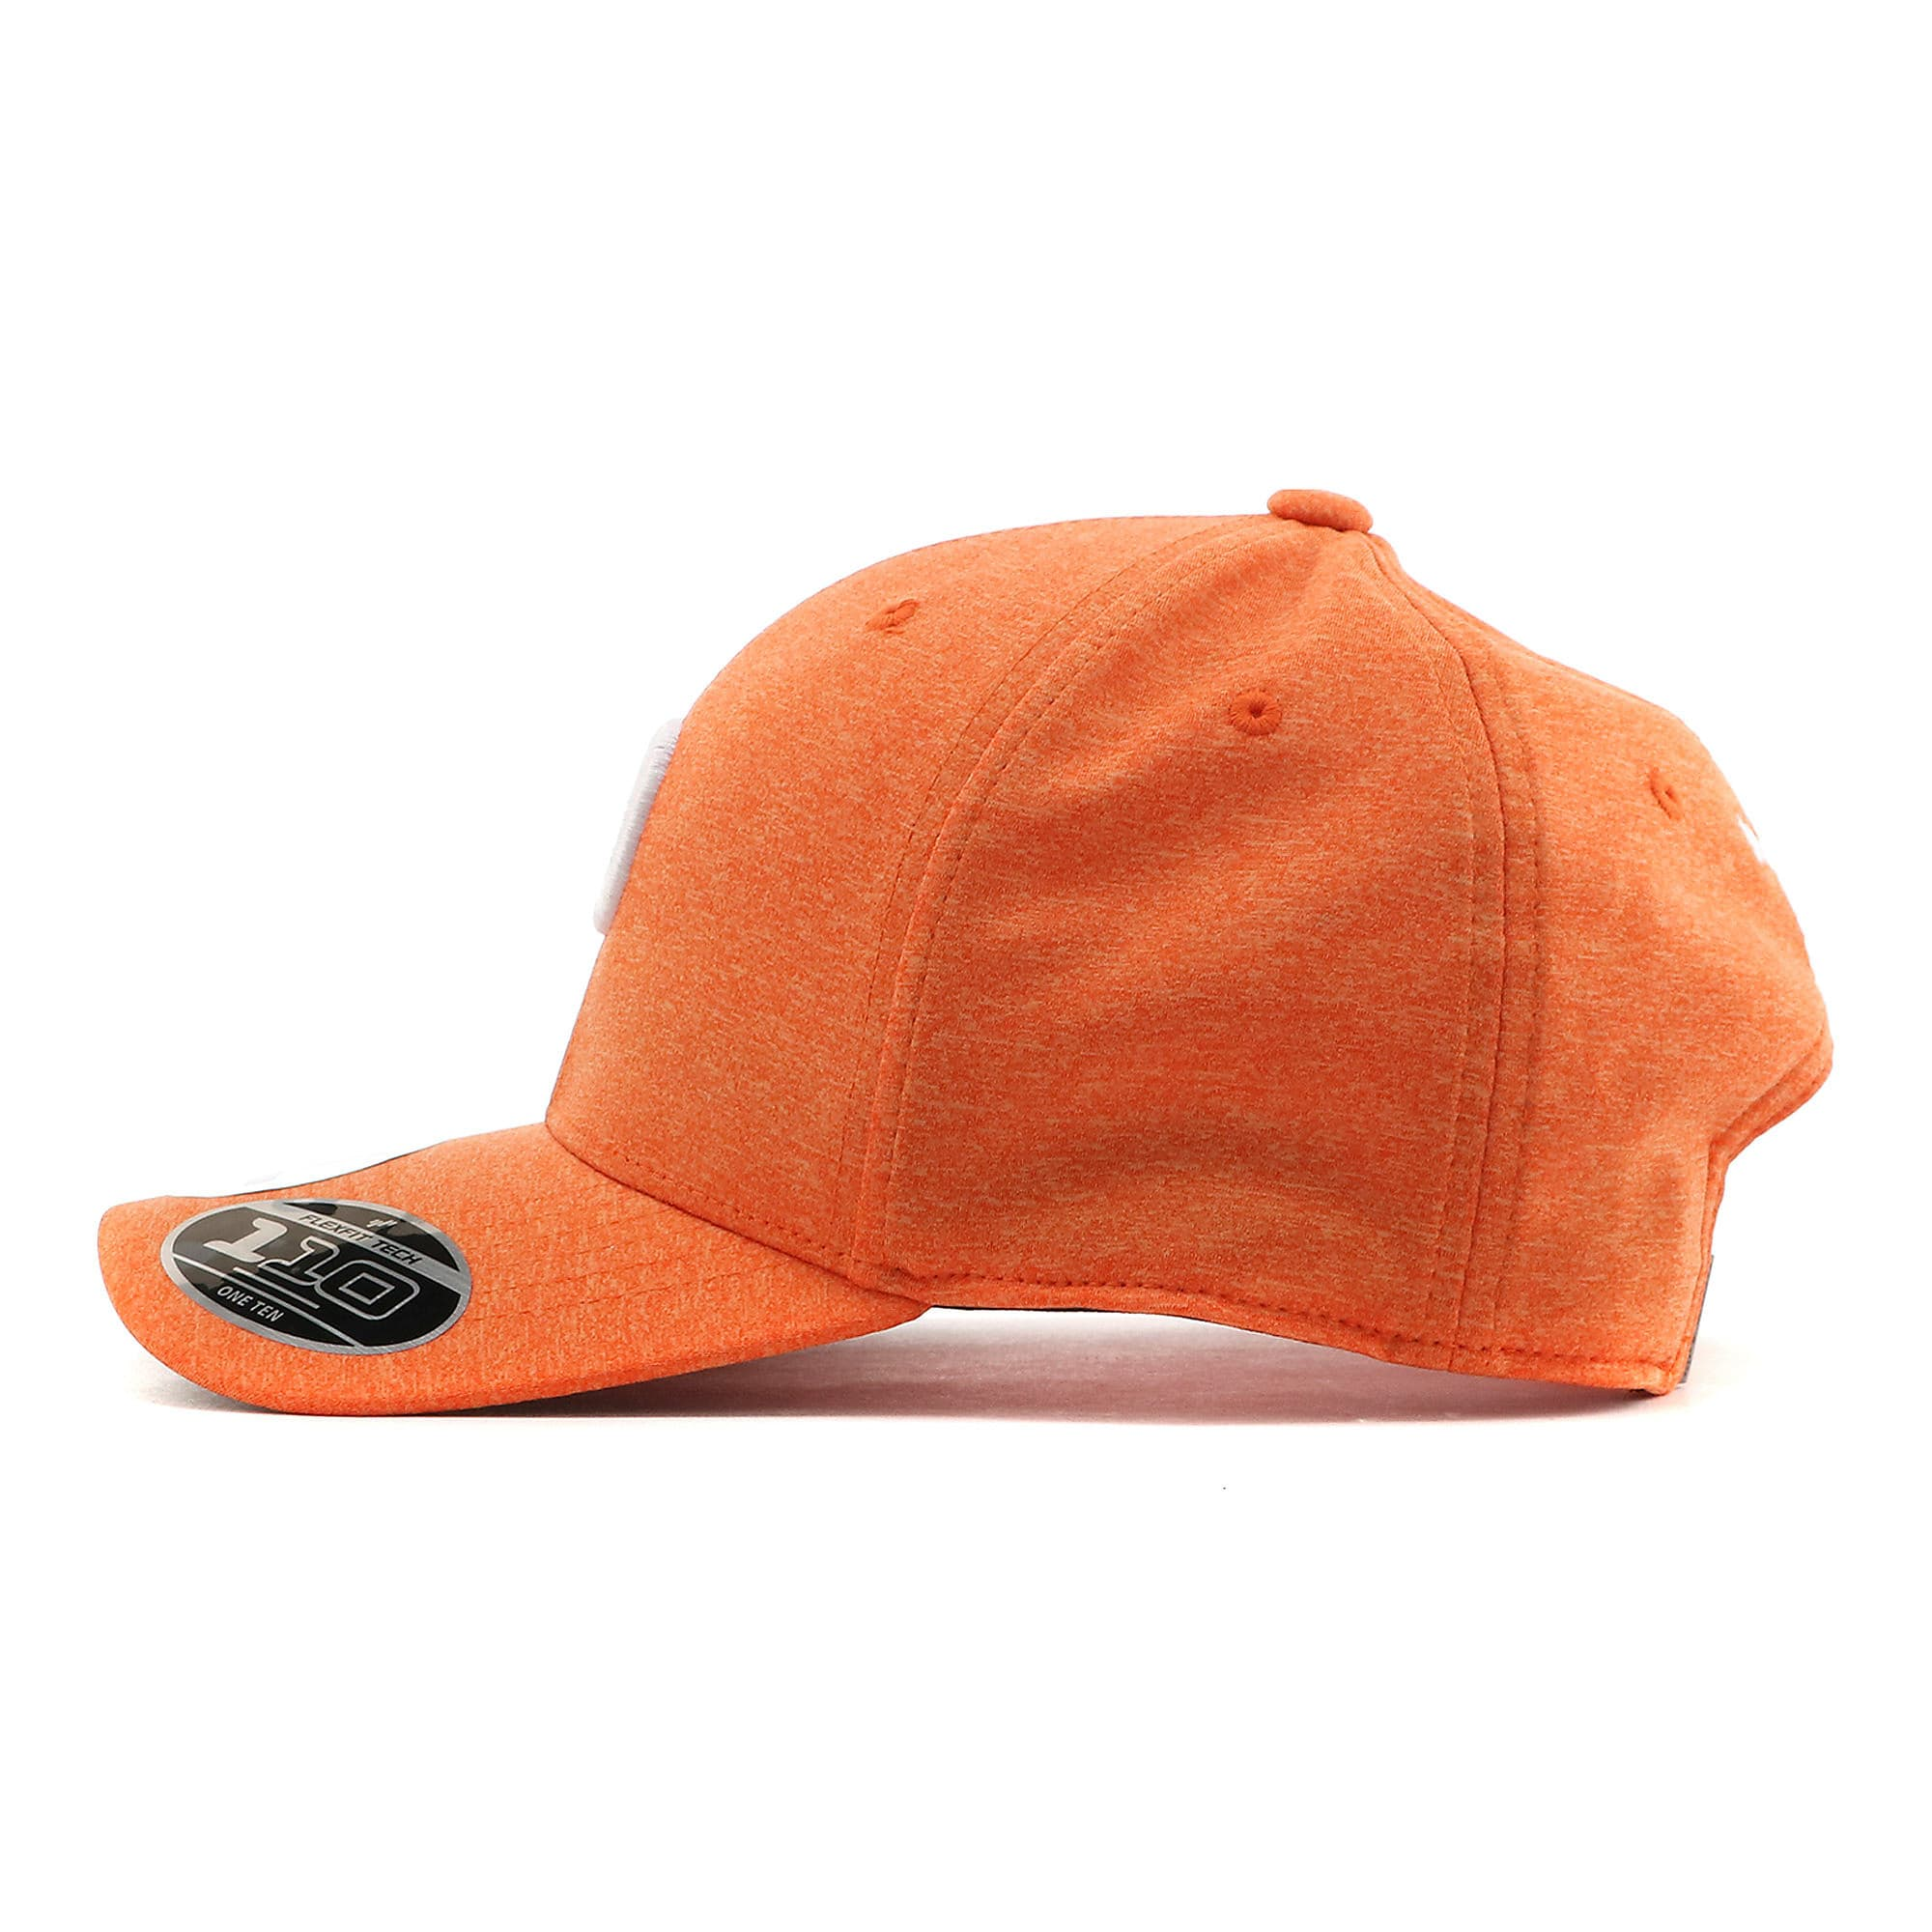 Thumbnail 3 of ゴルフ Pマークスナップバックキャップ, Vibrant Orange, medium-JPN